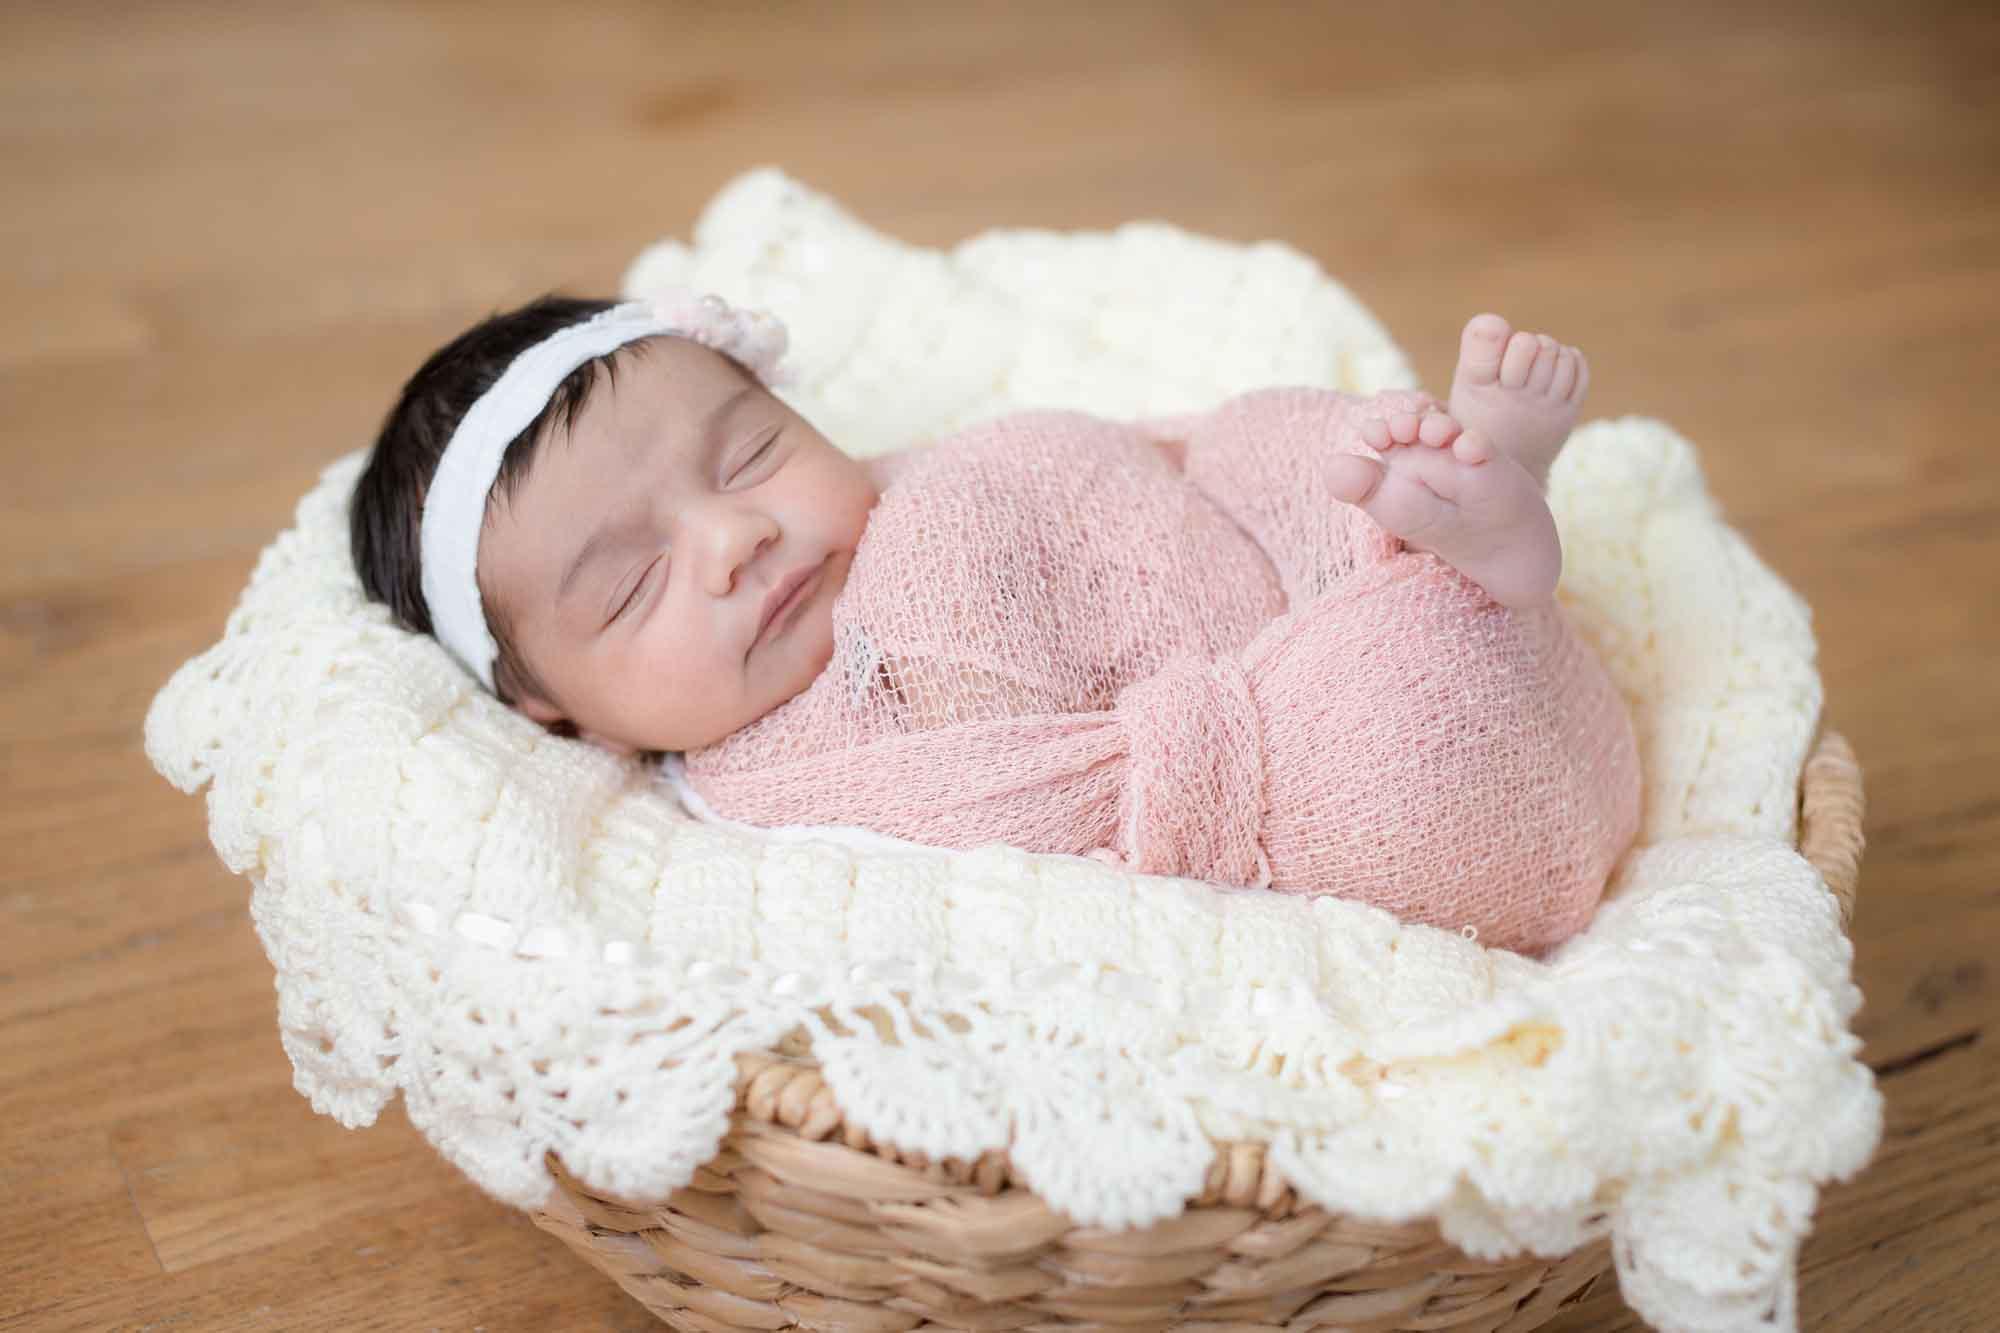 newborn photography okc - maternity photography okc